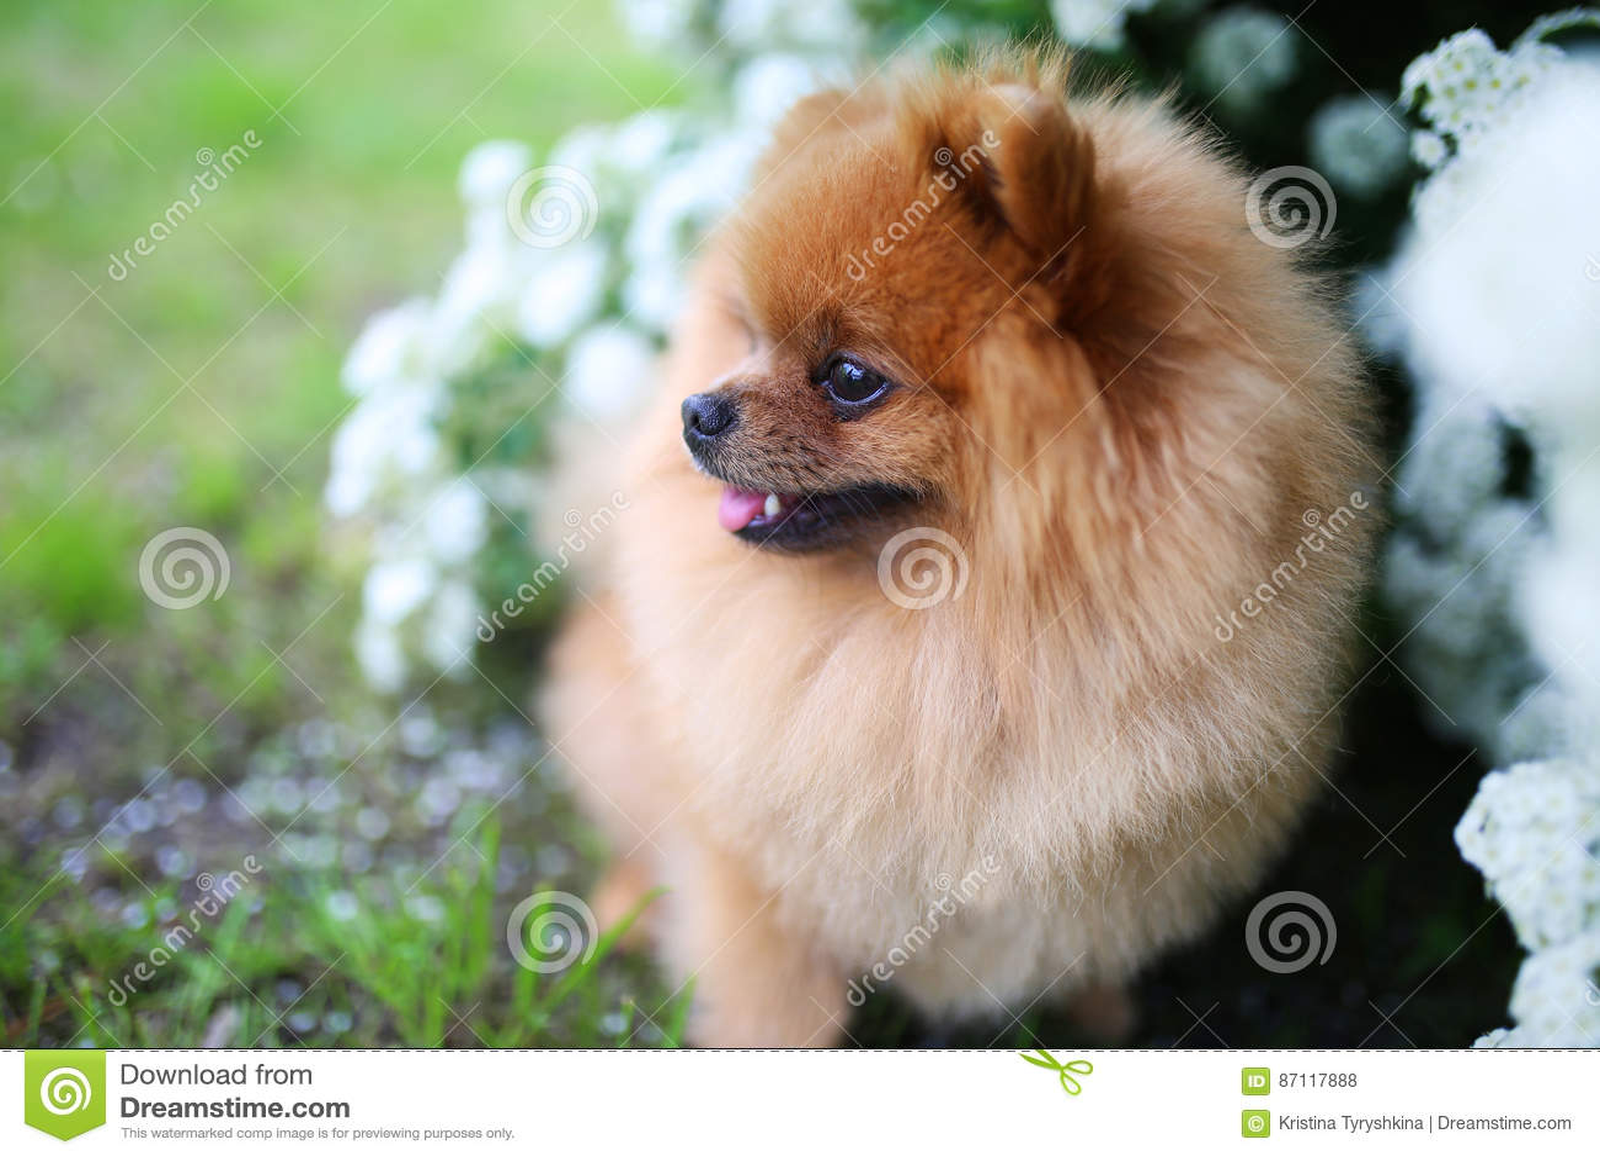 Beautiful Dog Pomeranian Dog Near Blossoming White Bush Pomeranian